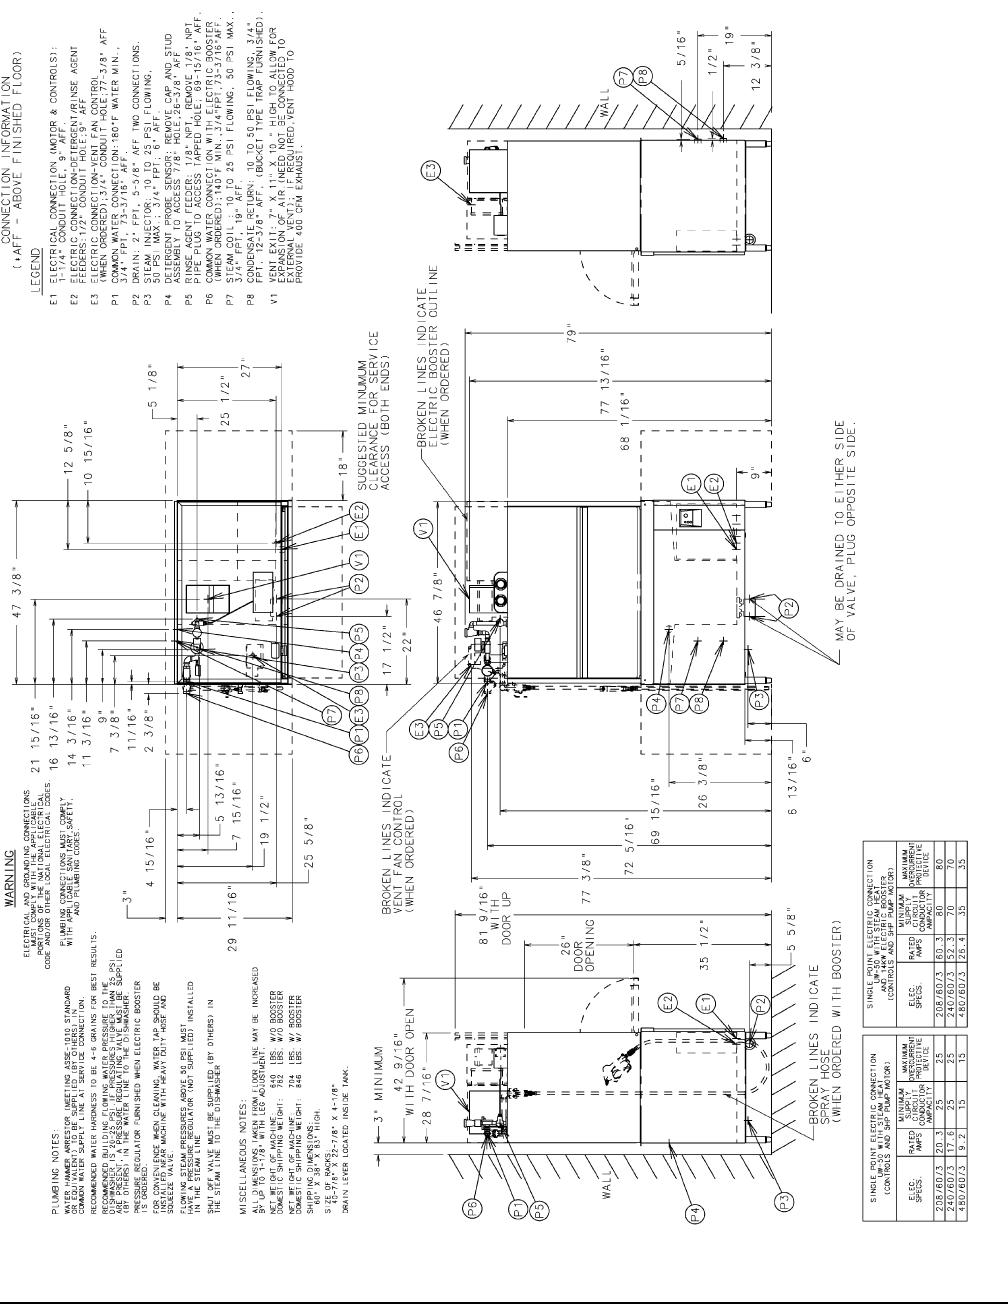 UW50 Utensil Washer Electric Heat 208 240/60/3 WAREWASHING